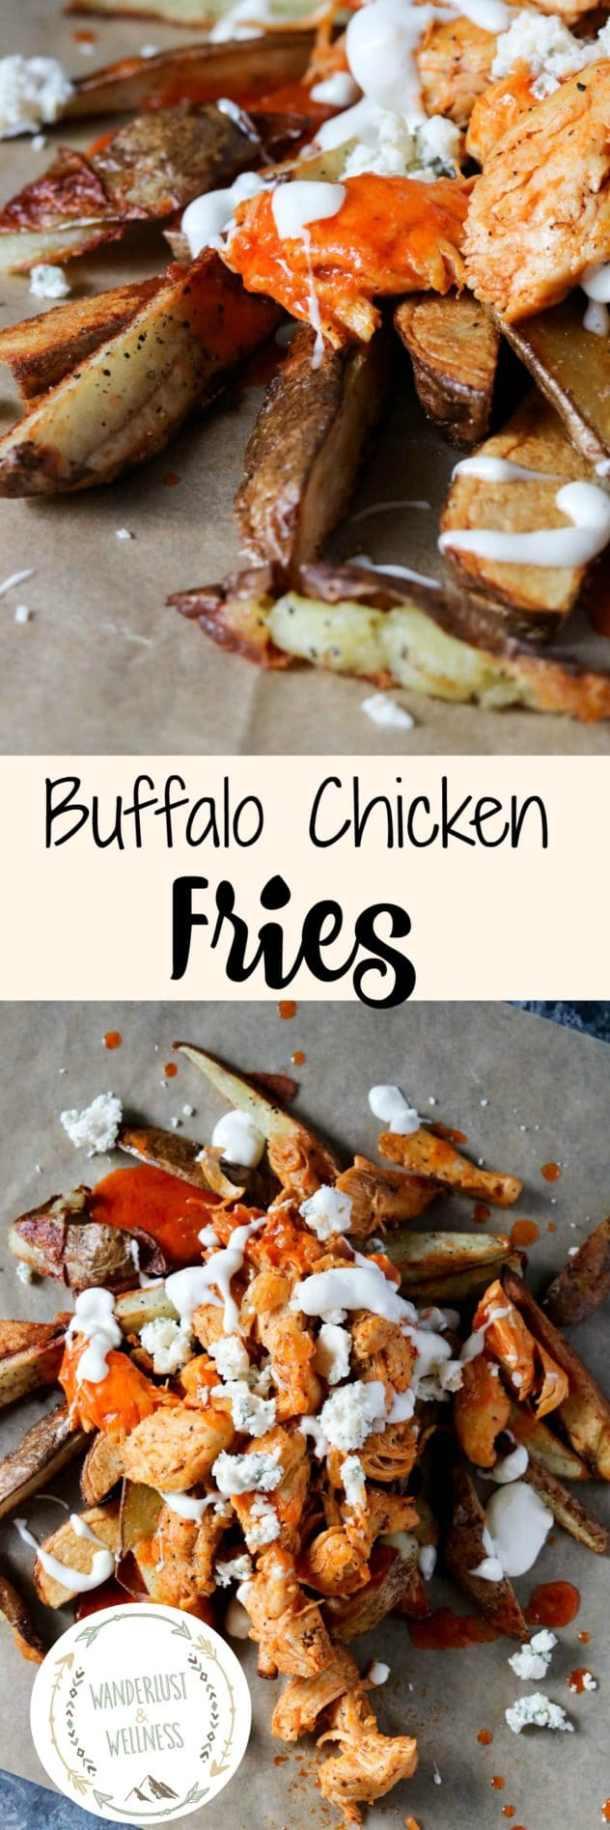 Homemade Buffalo Chicken Fries